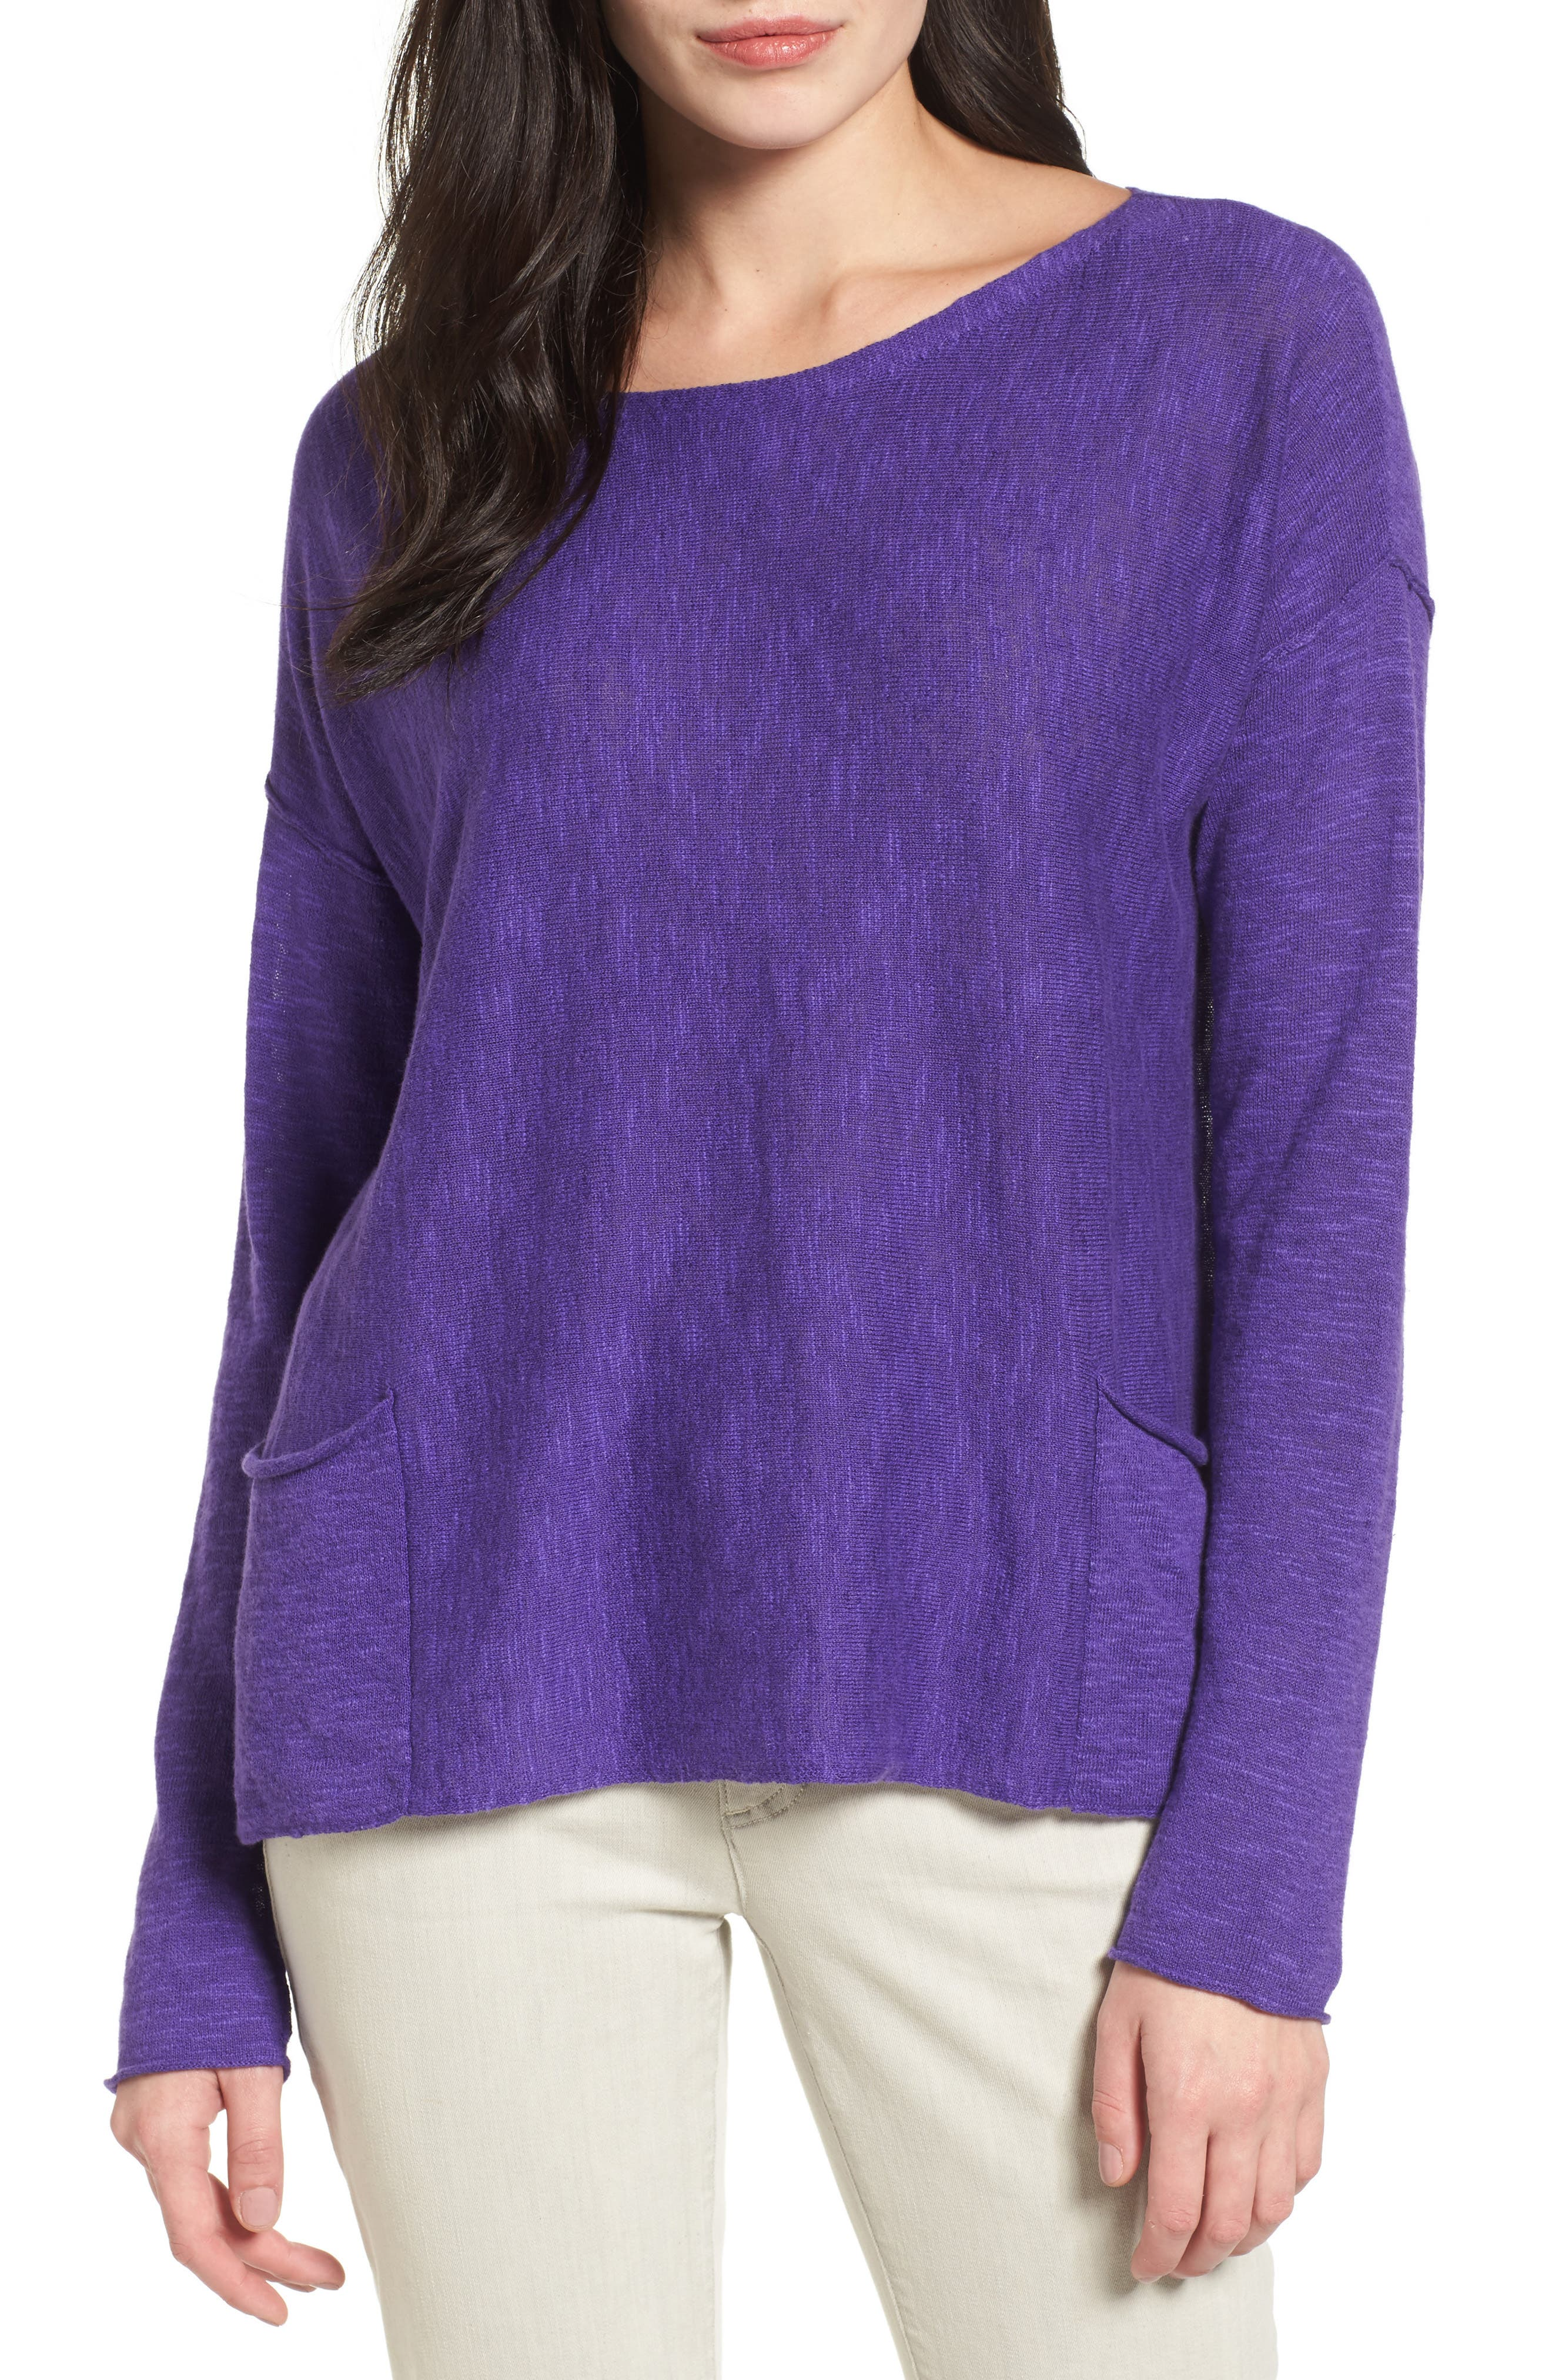 Main Image - Eileen Fisher Organic Linen & Cotton Knit Boxy Top (Regular & Petite)